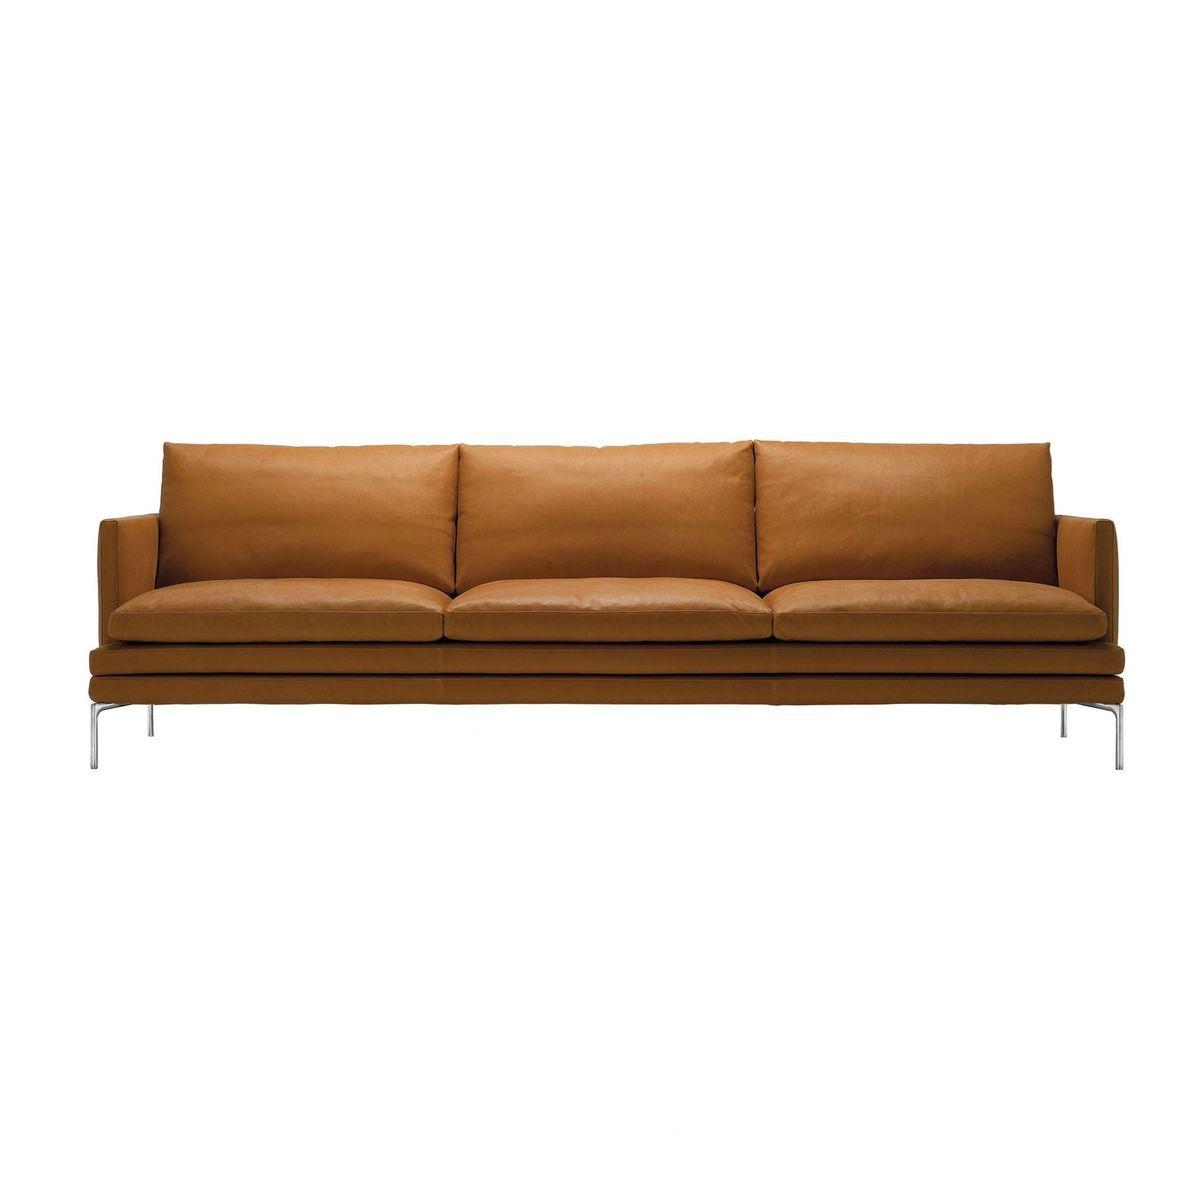 William 1330 3 Seater Sofa Leather Sofa Sofa Design Sofa